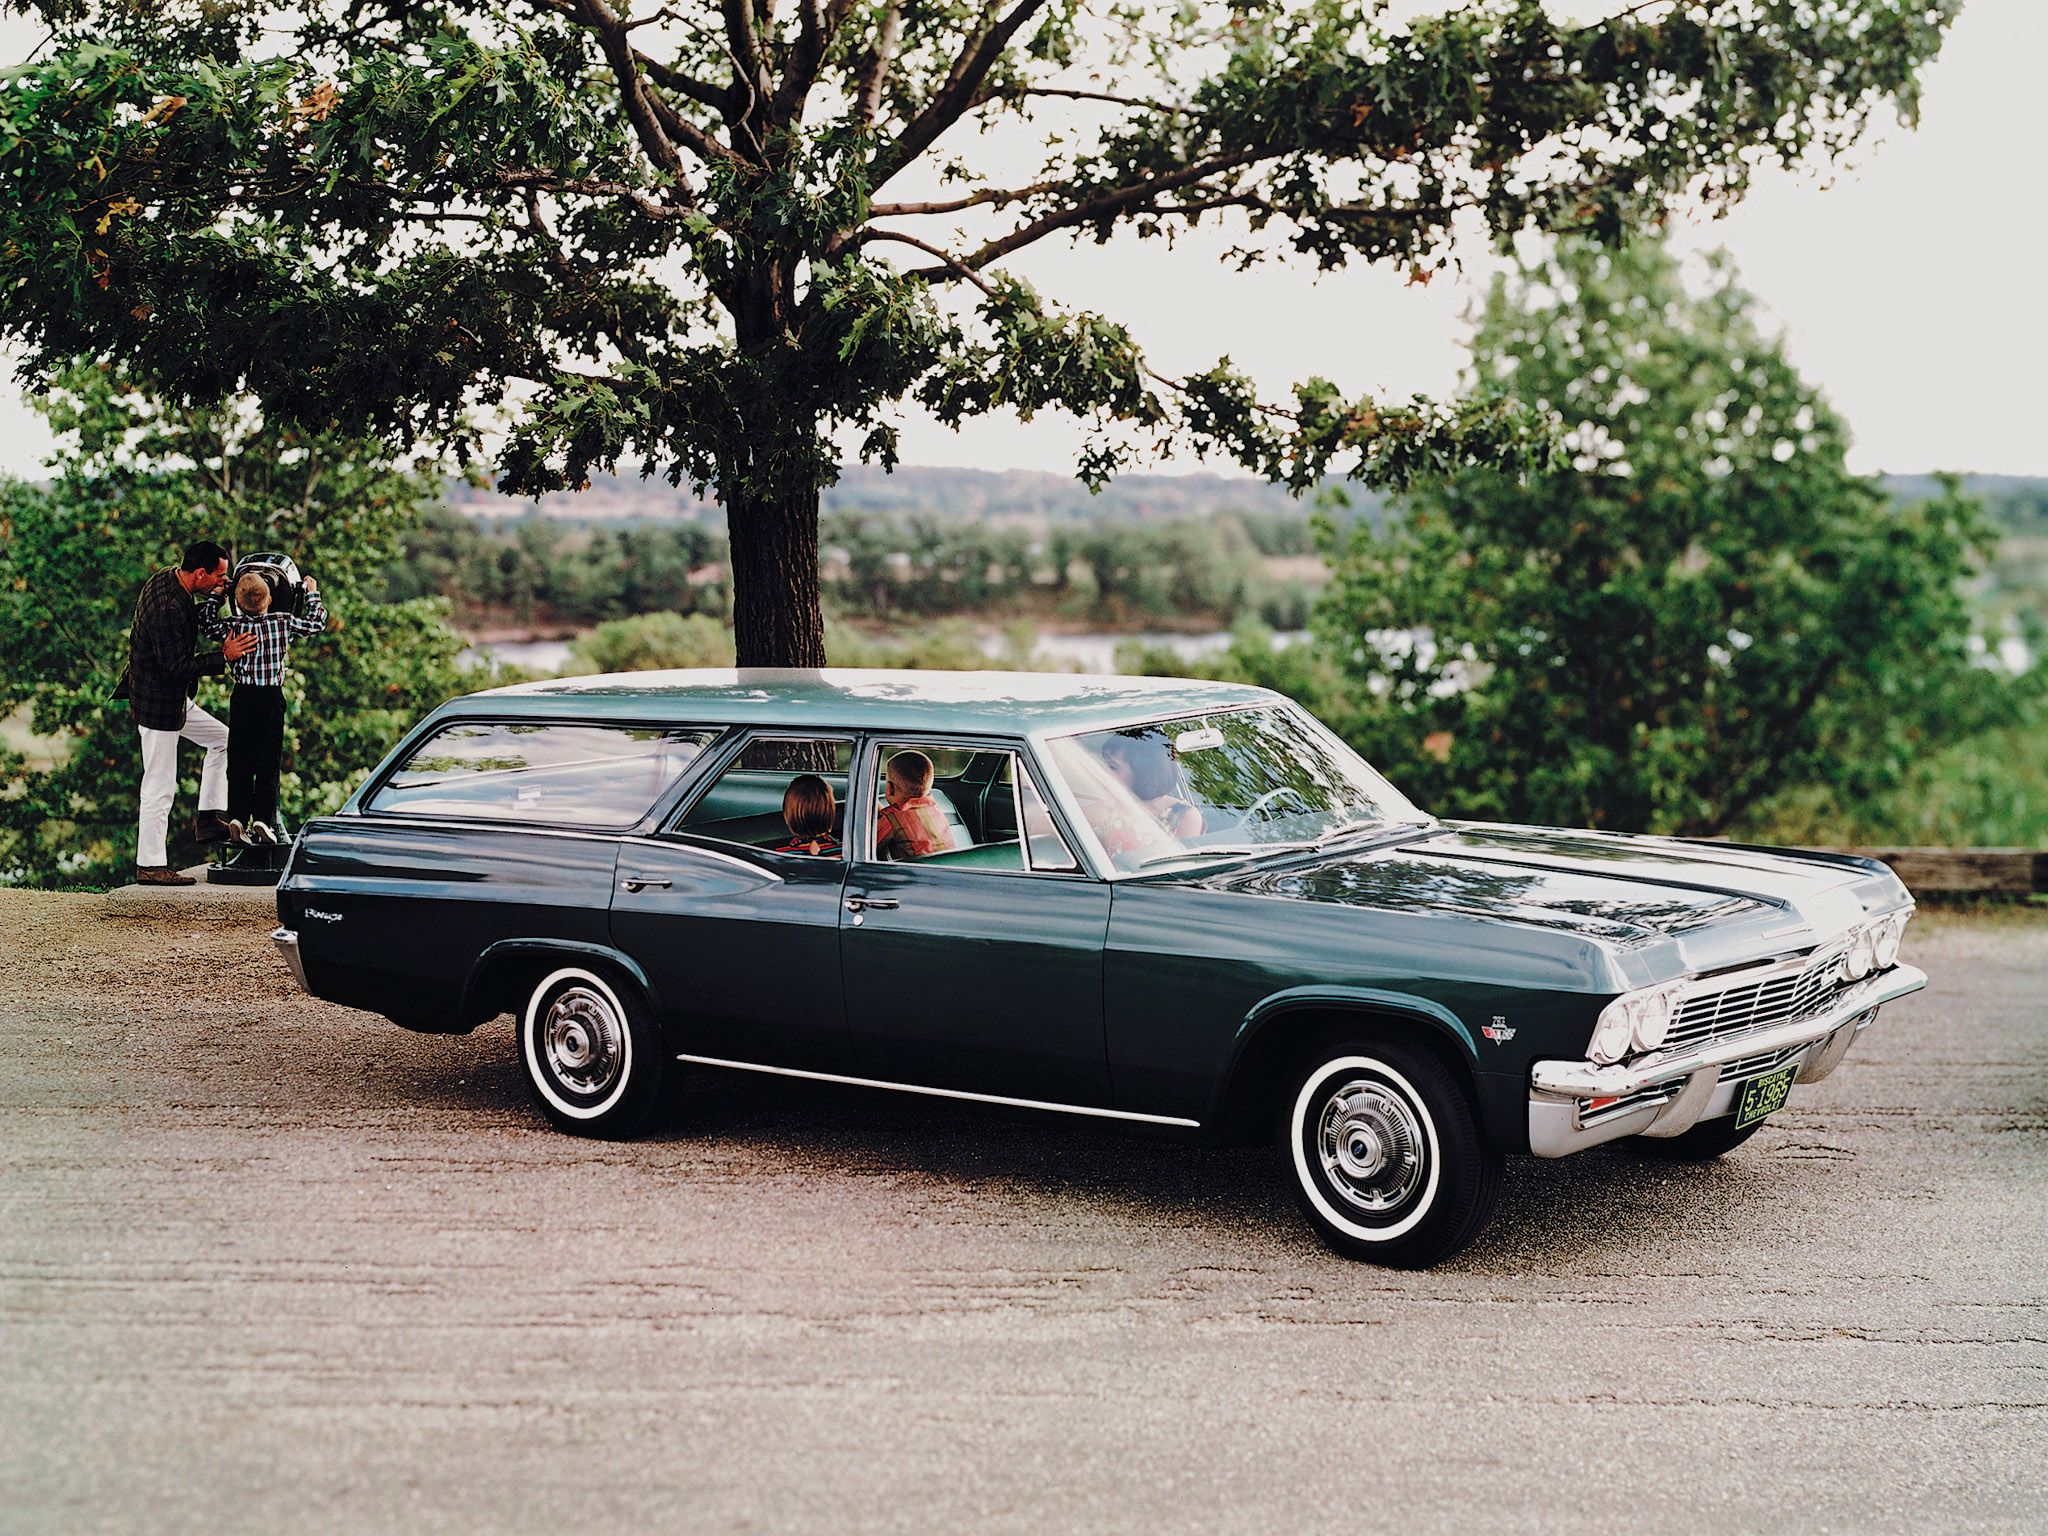 1965 chevrolet biscayne station wagon